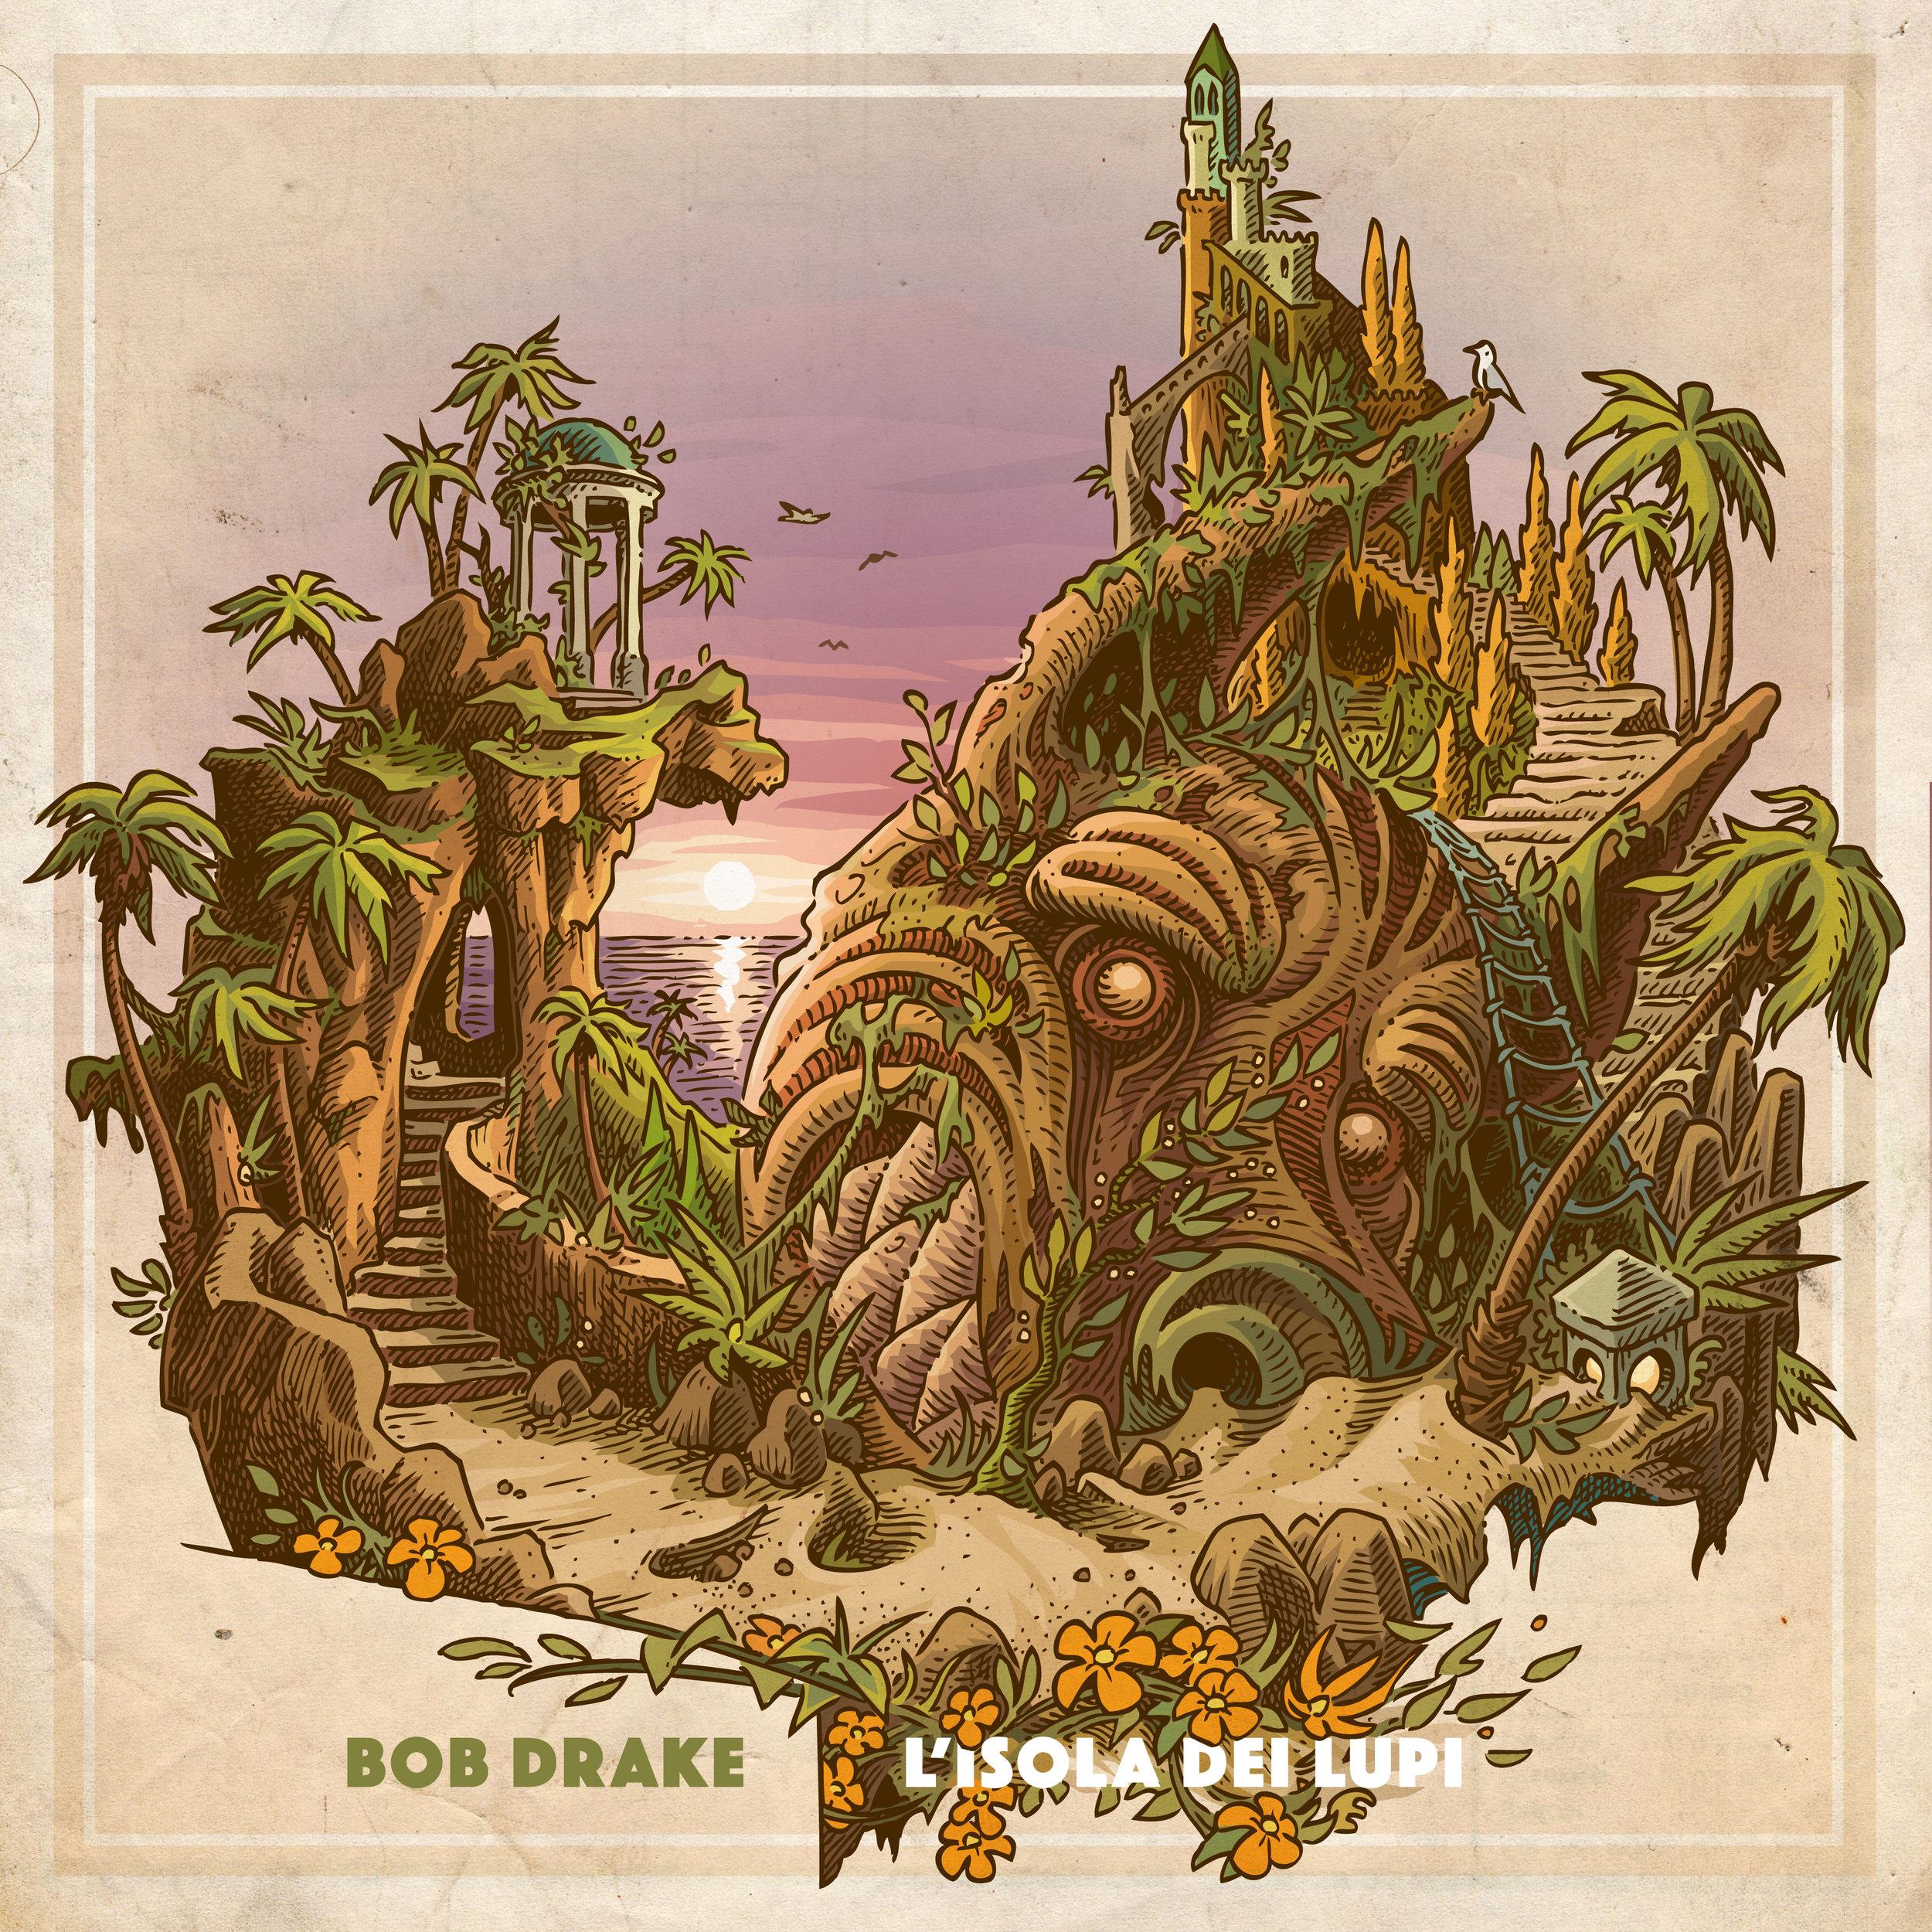 L'Isola dei Lupi album cover.jpg